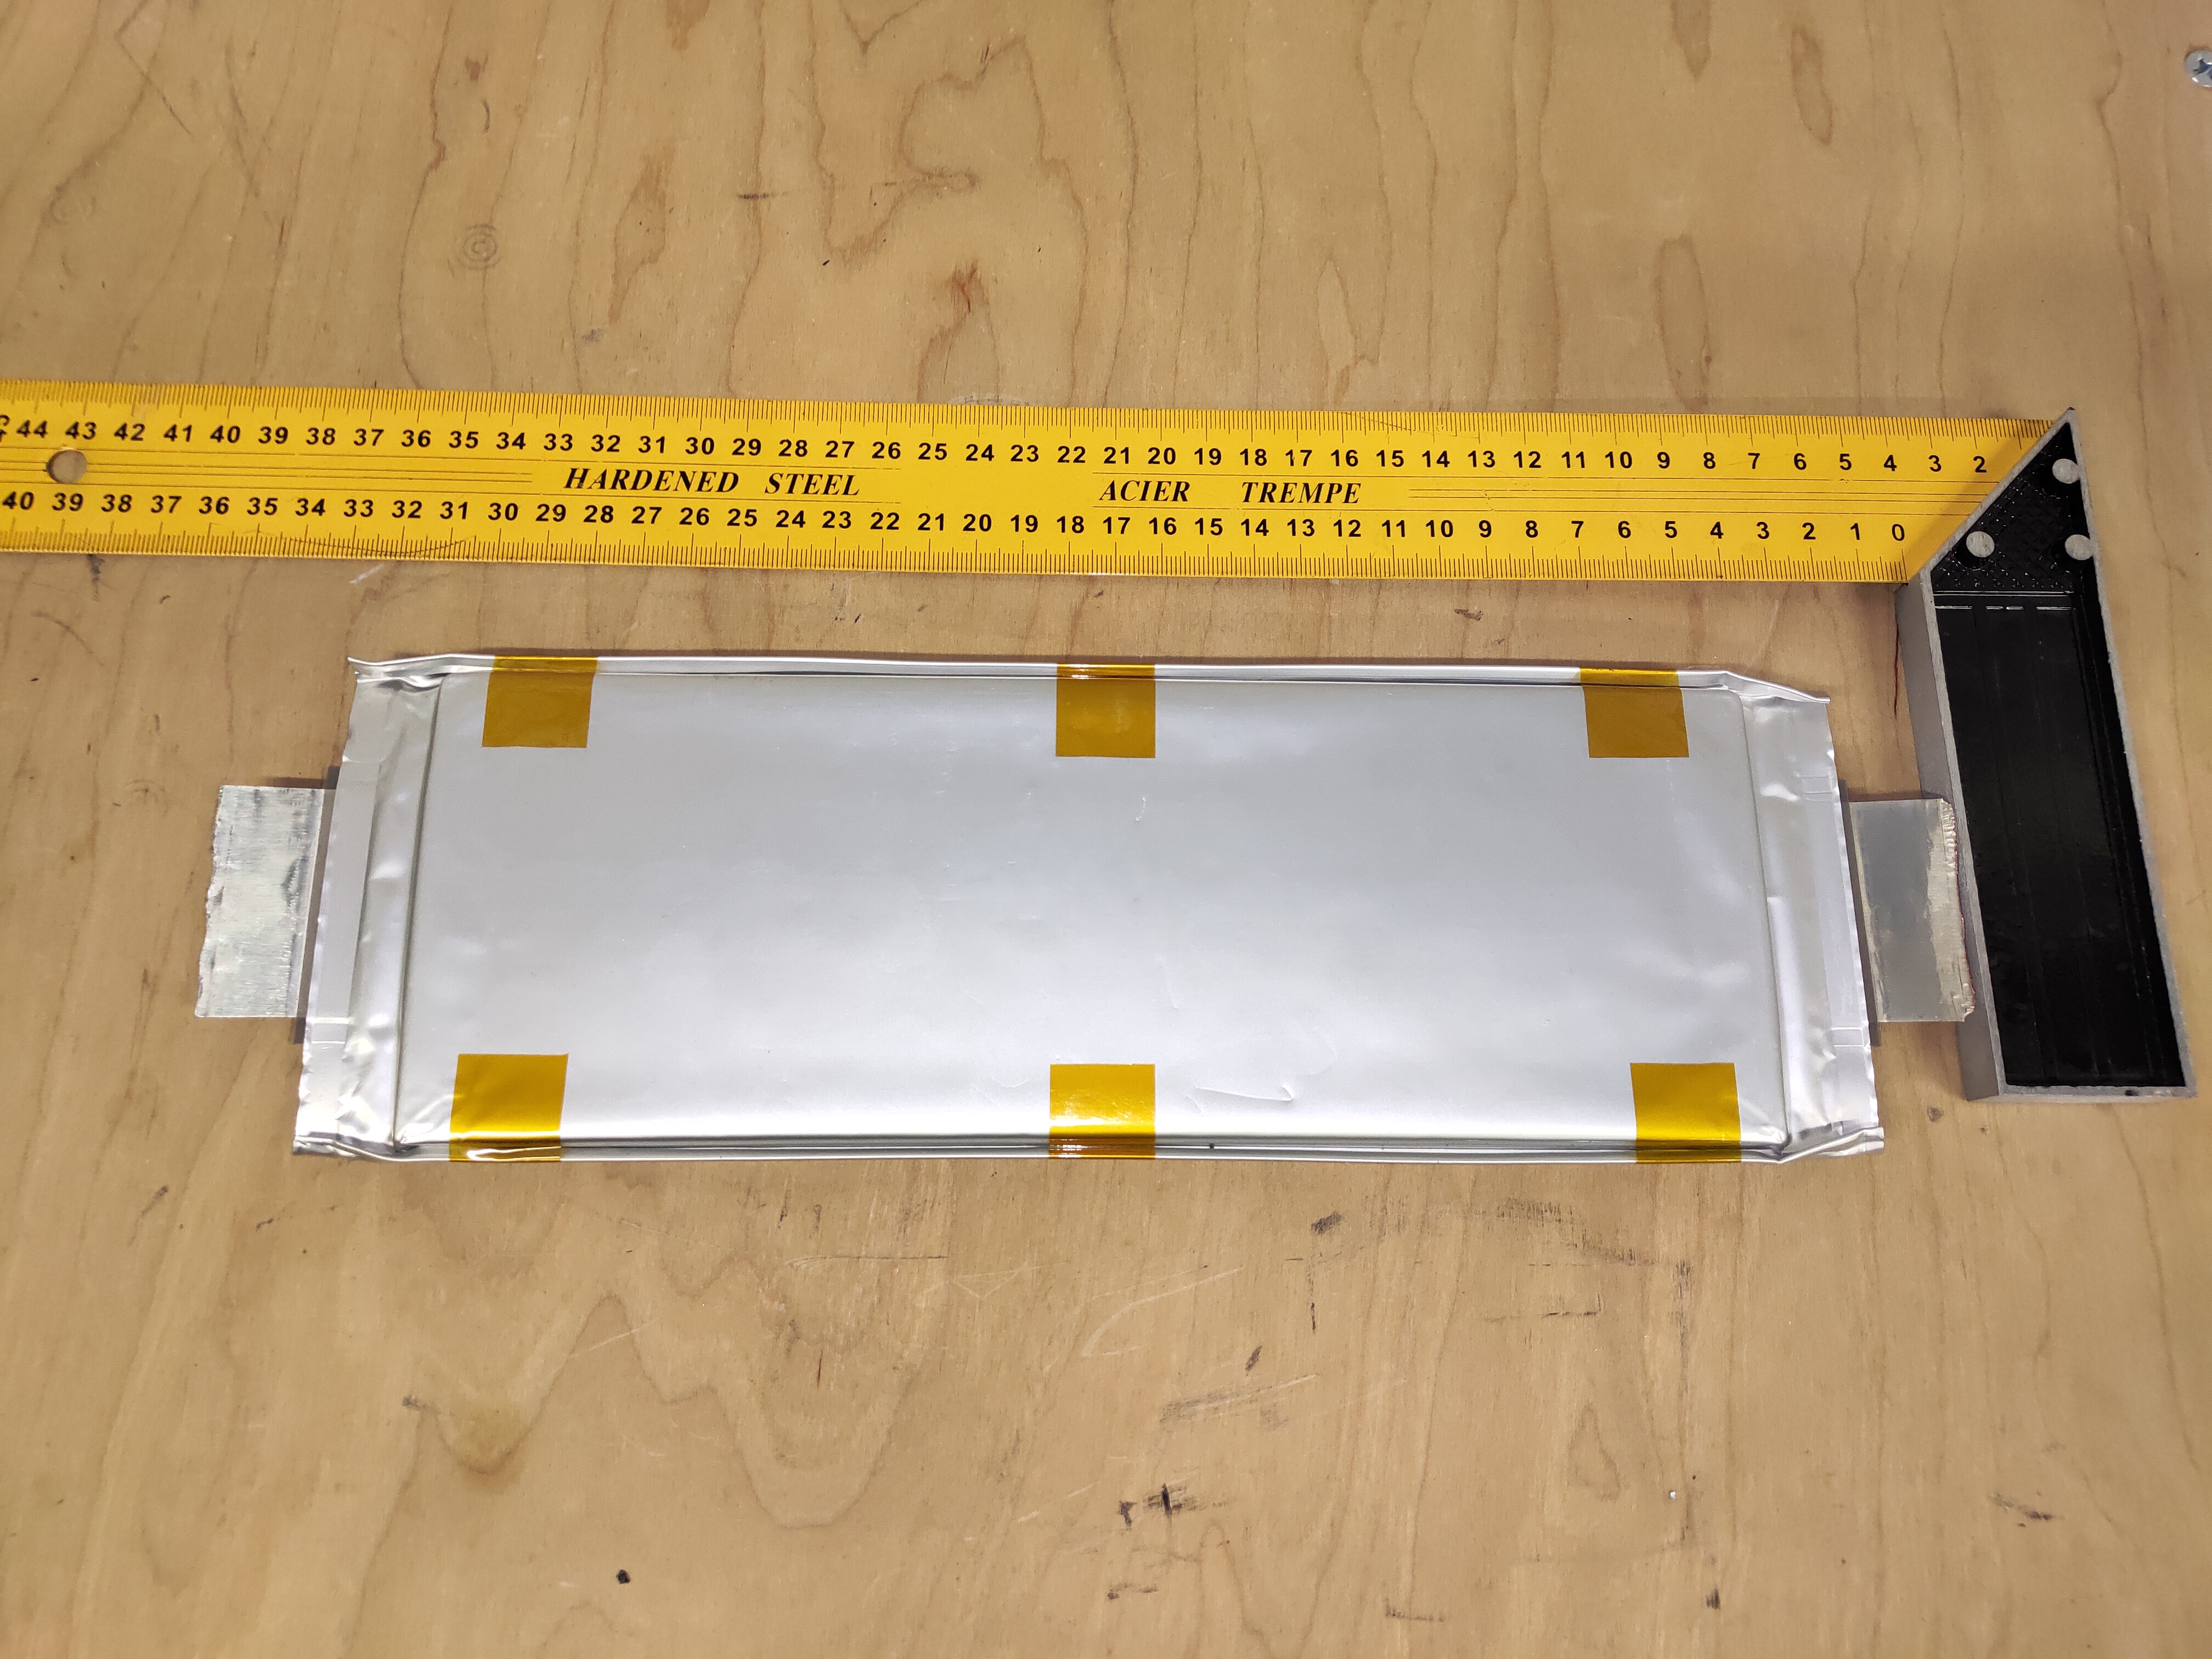 Аккумуляторы для электротранспорта LiNMC 60Ач (Сборка / отправка)